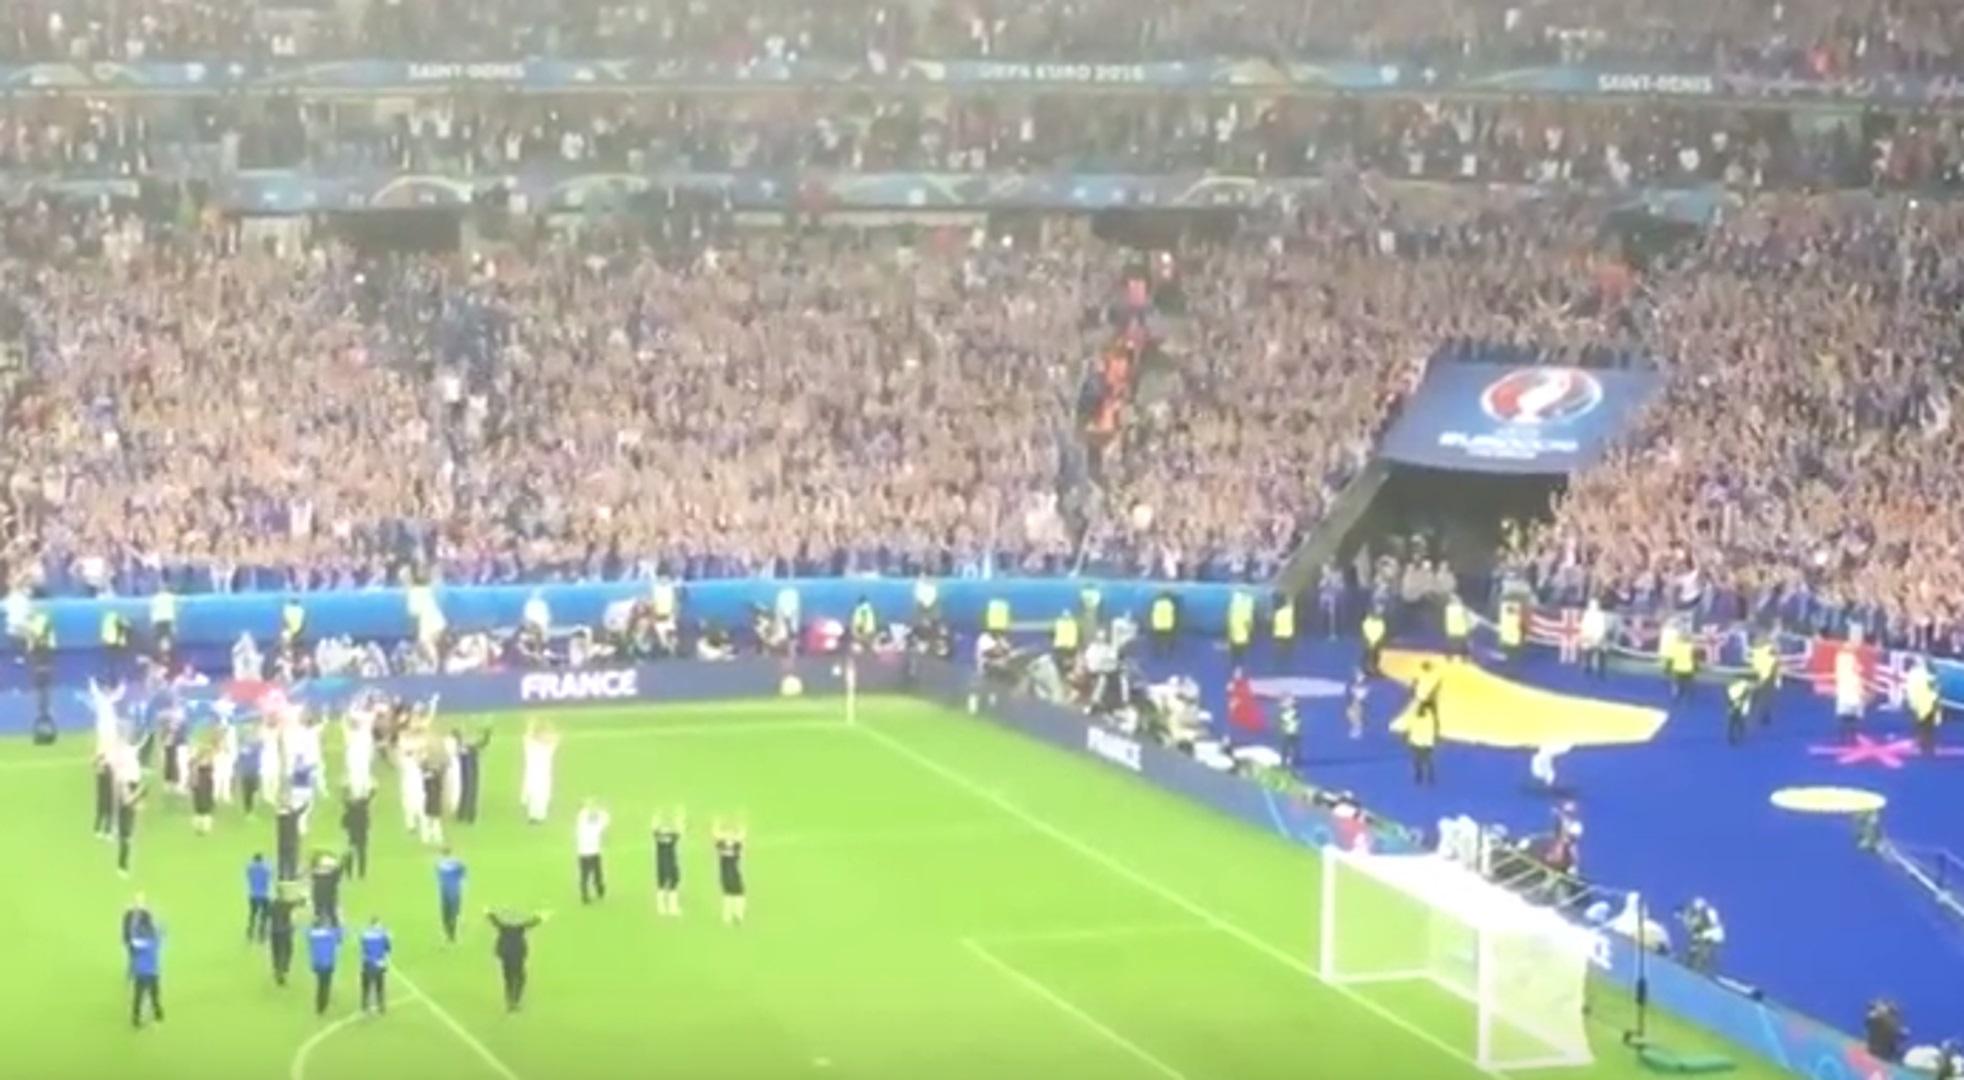 Islands Fans im Stade de France